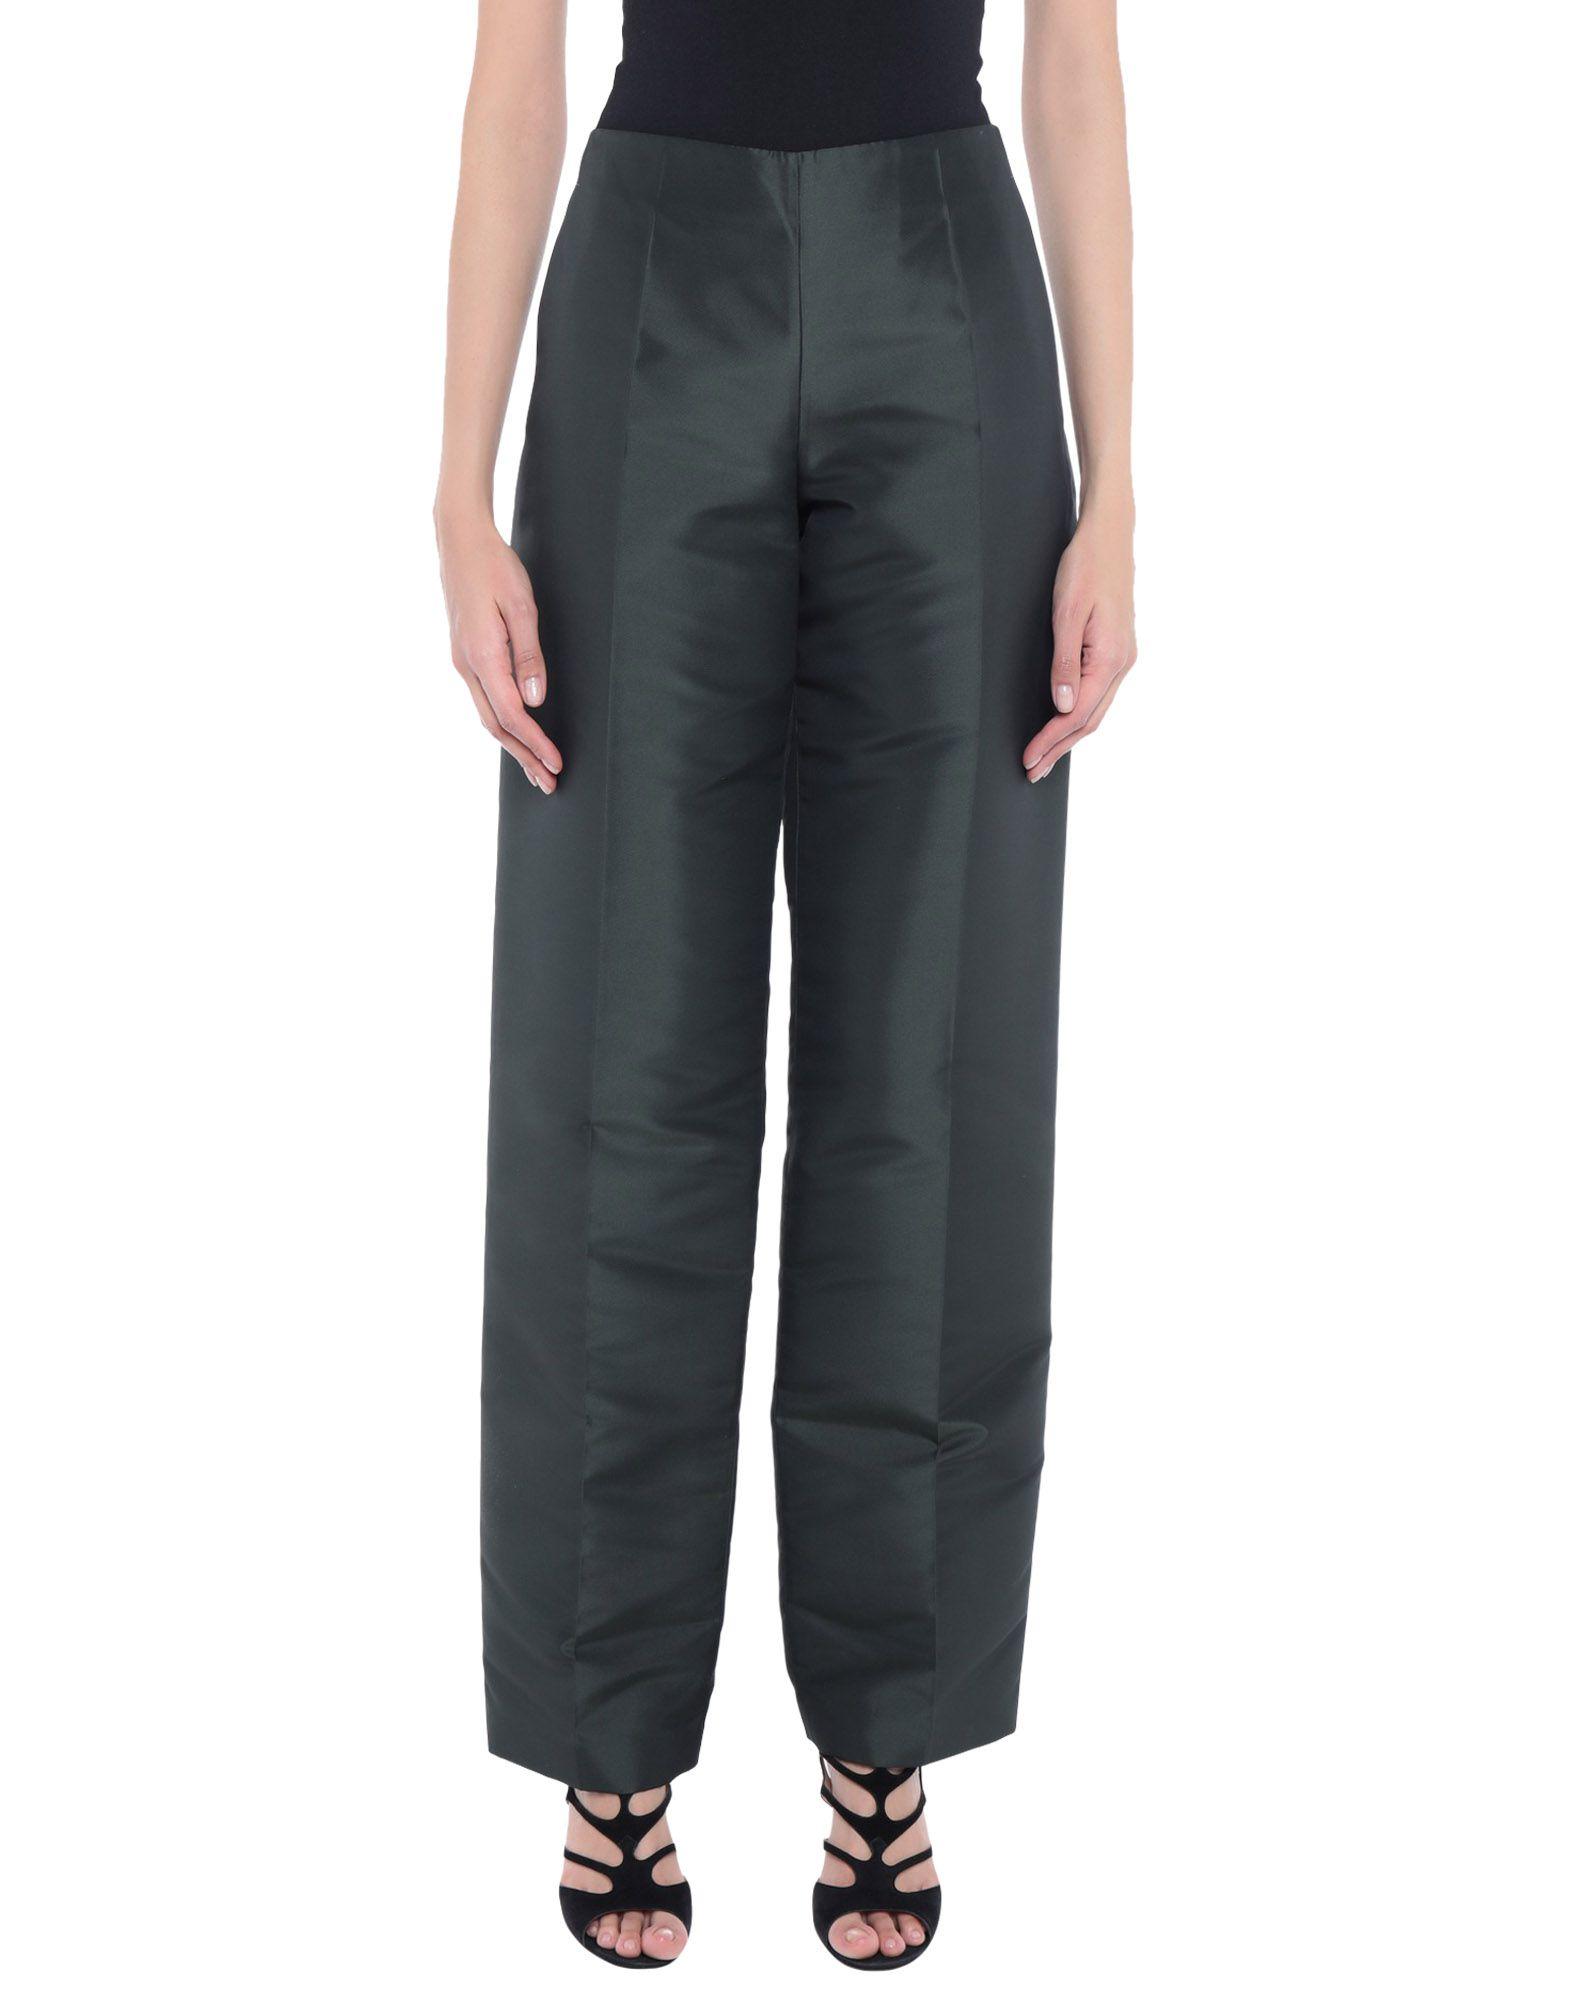 Фото - JEAN PAUL GAULTIER FEMME Повседневные брюки jean paul gaultier le male